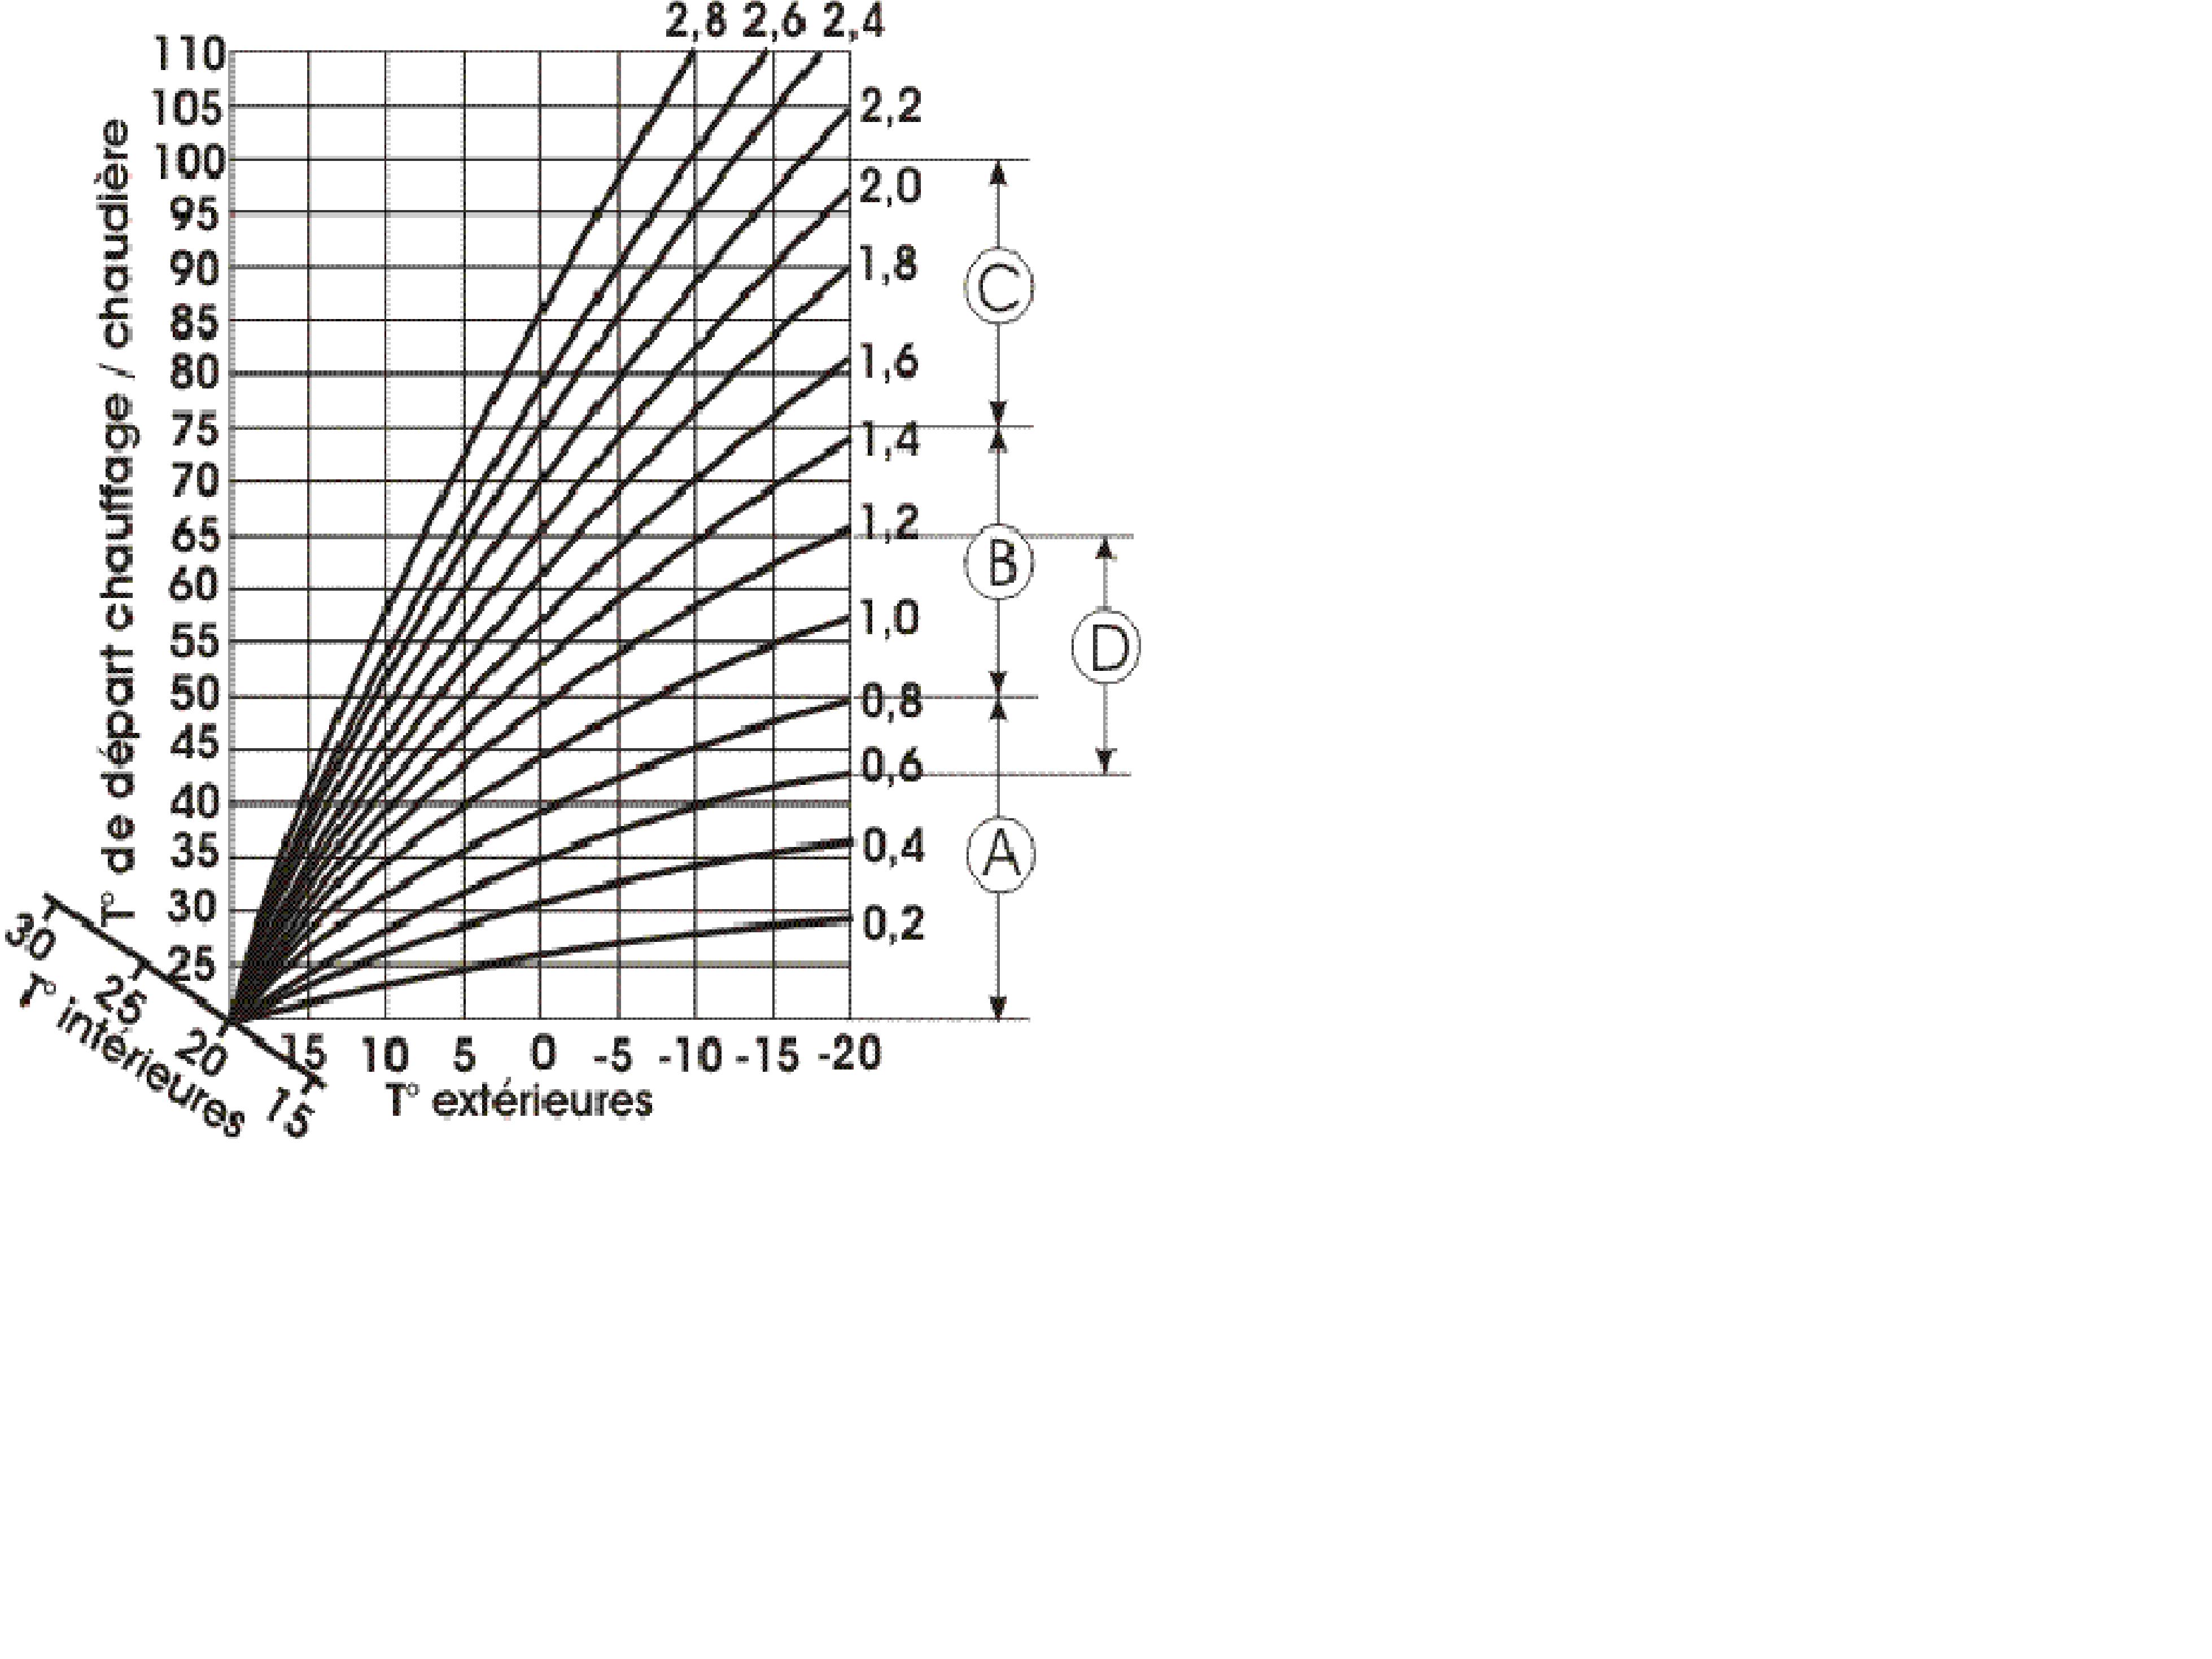 courbe de chauffe.png, 137.8 kb, 3918 x 2938